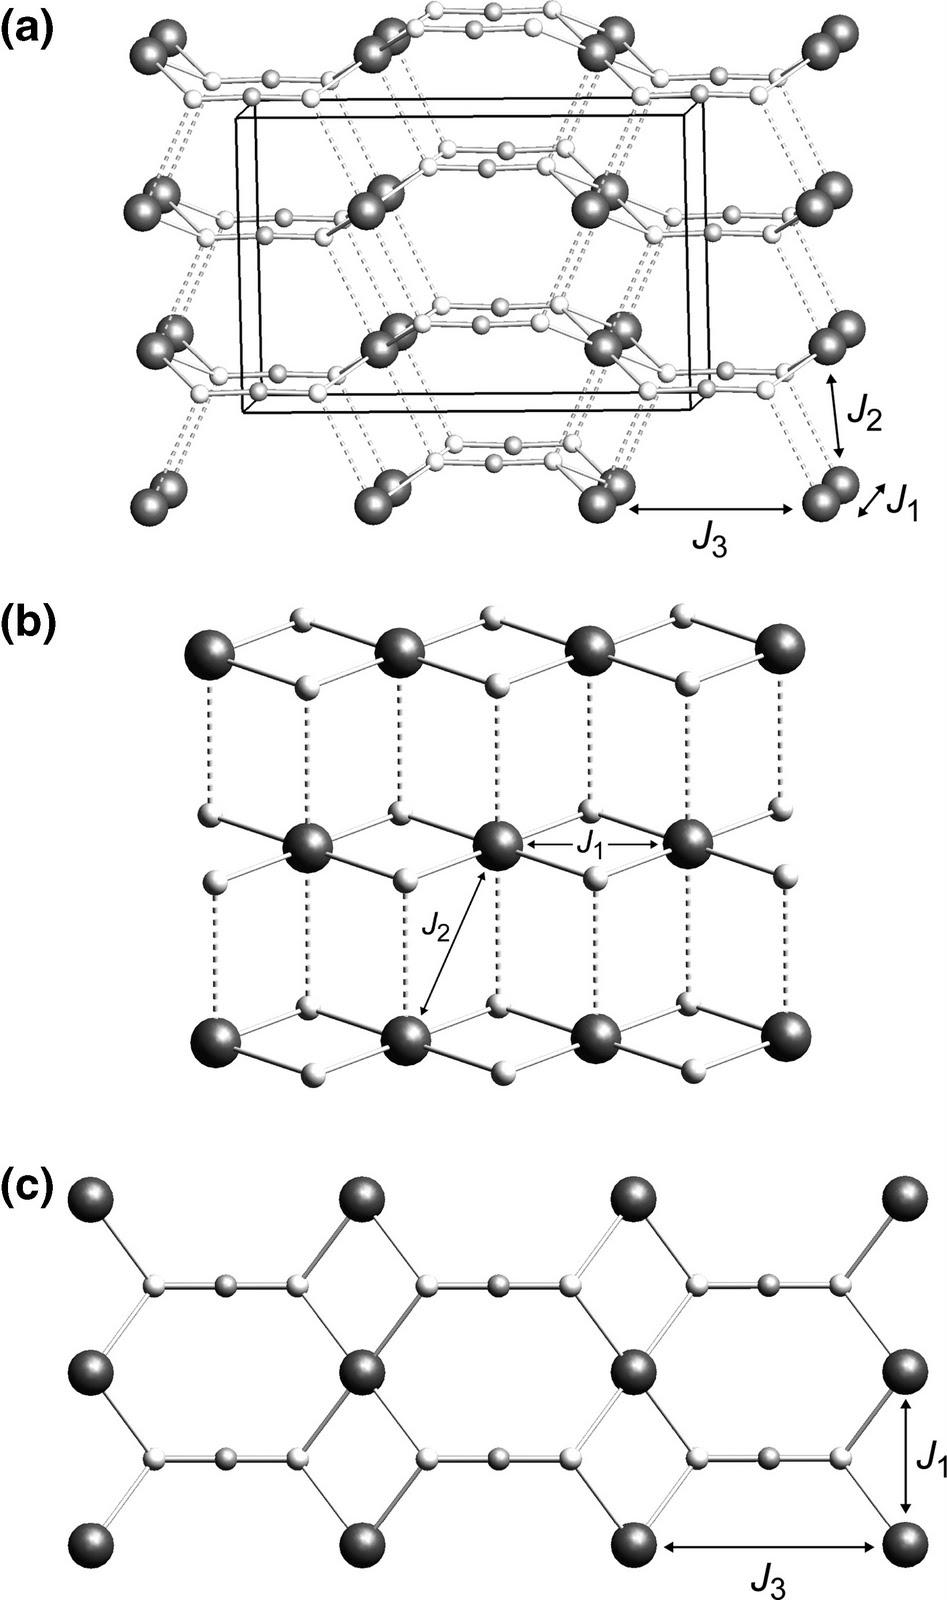 bohr diagram boron traffic club Lewis Dot Diagram for bohr model of boron displaying 20 images for bohr model of boronbohr diagram boron